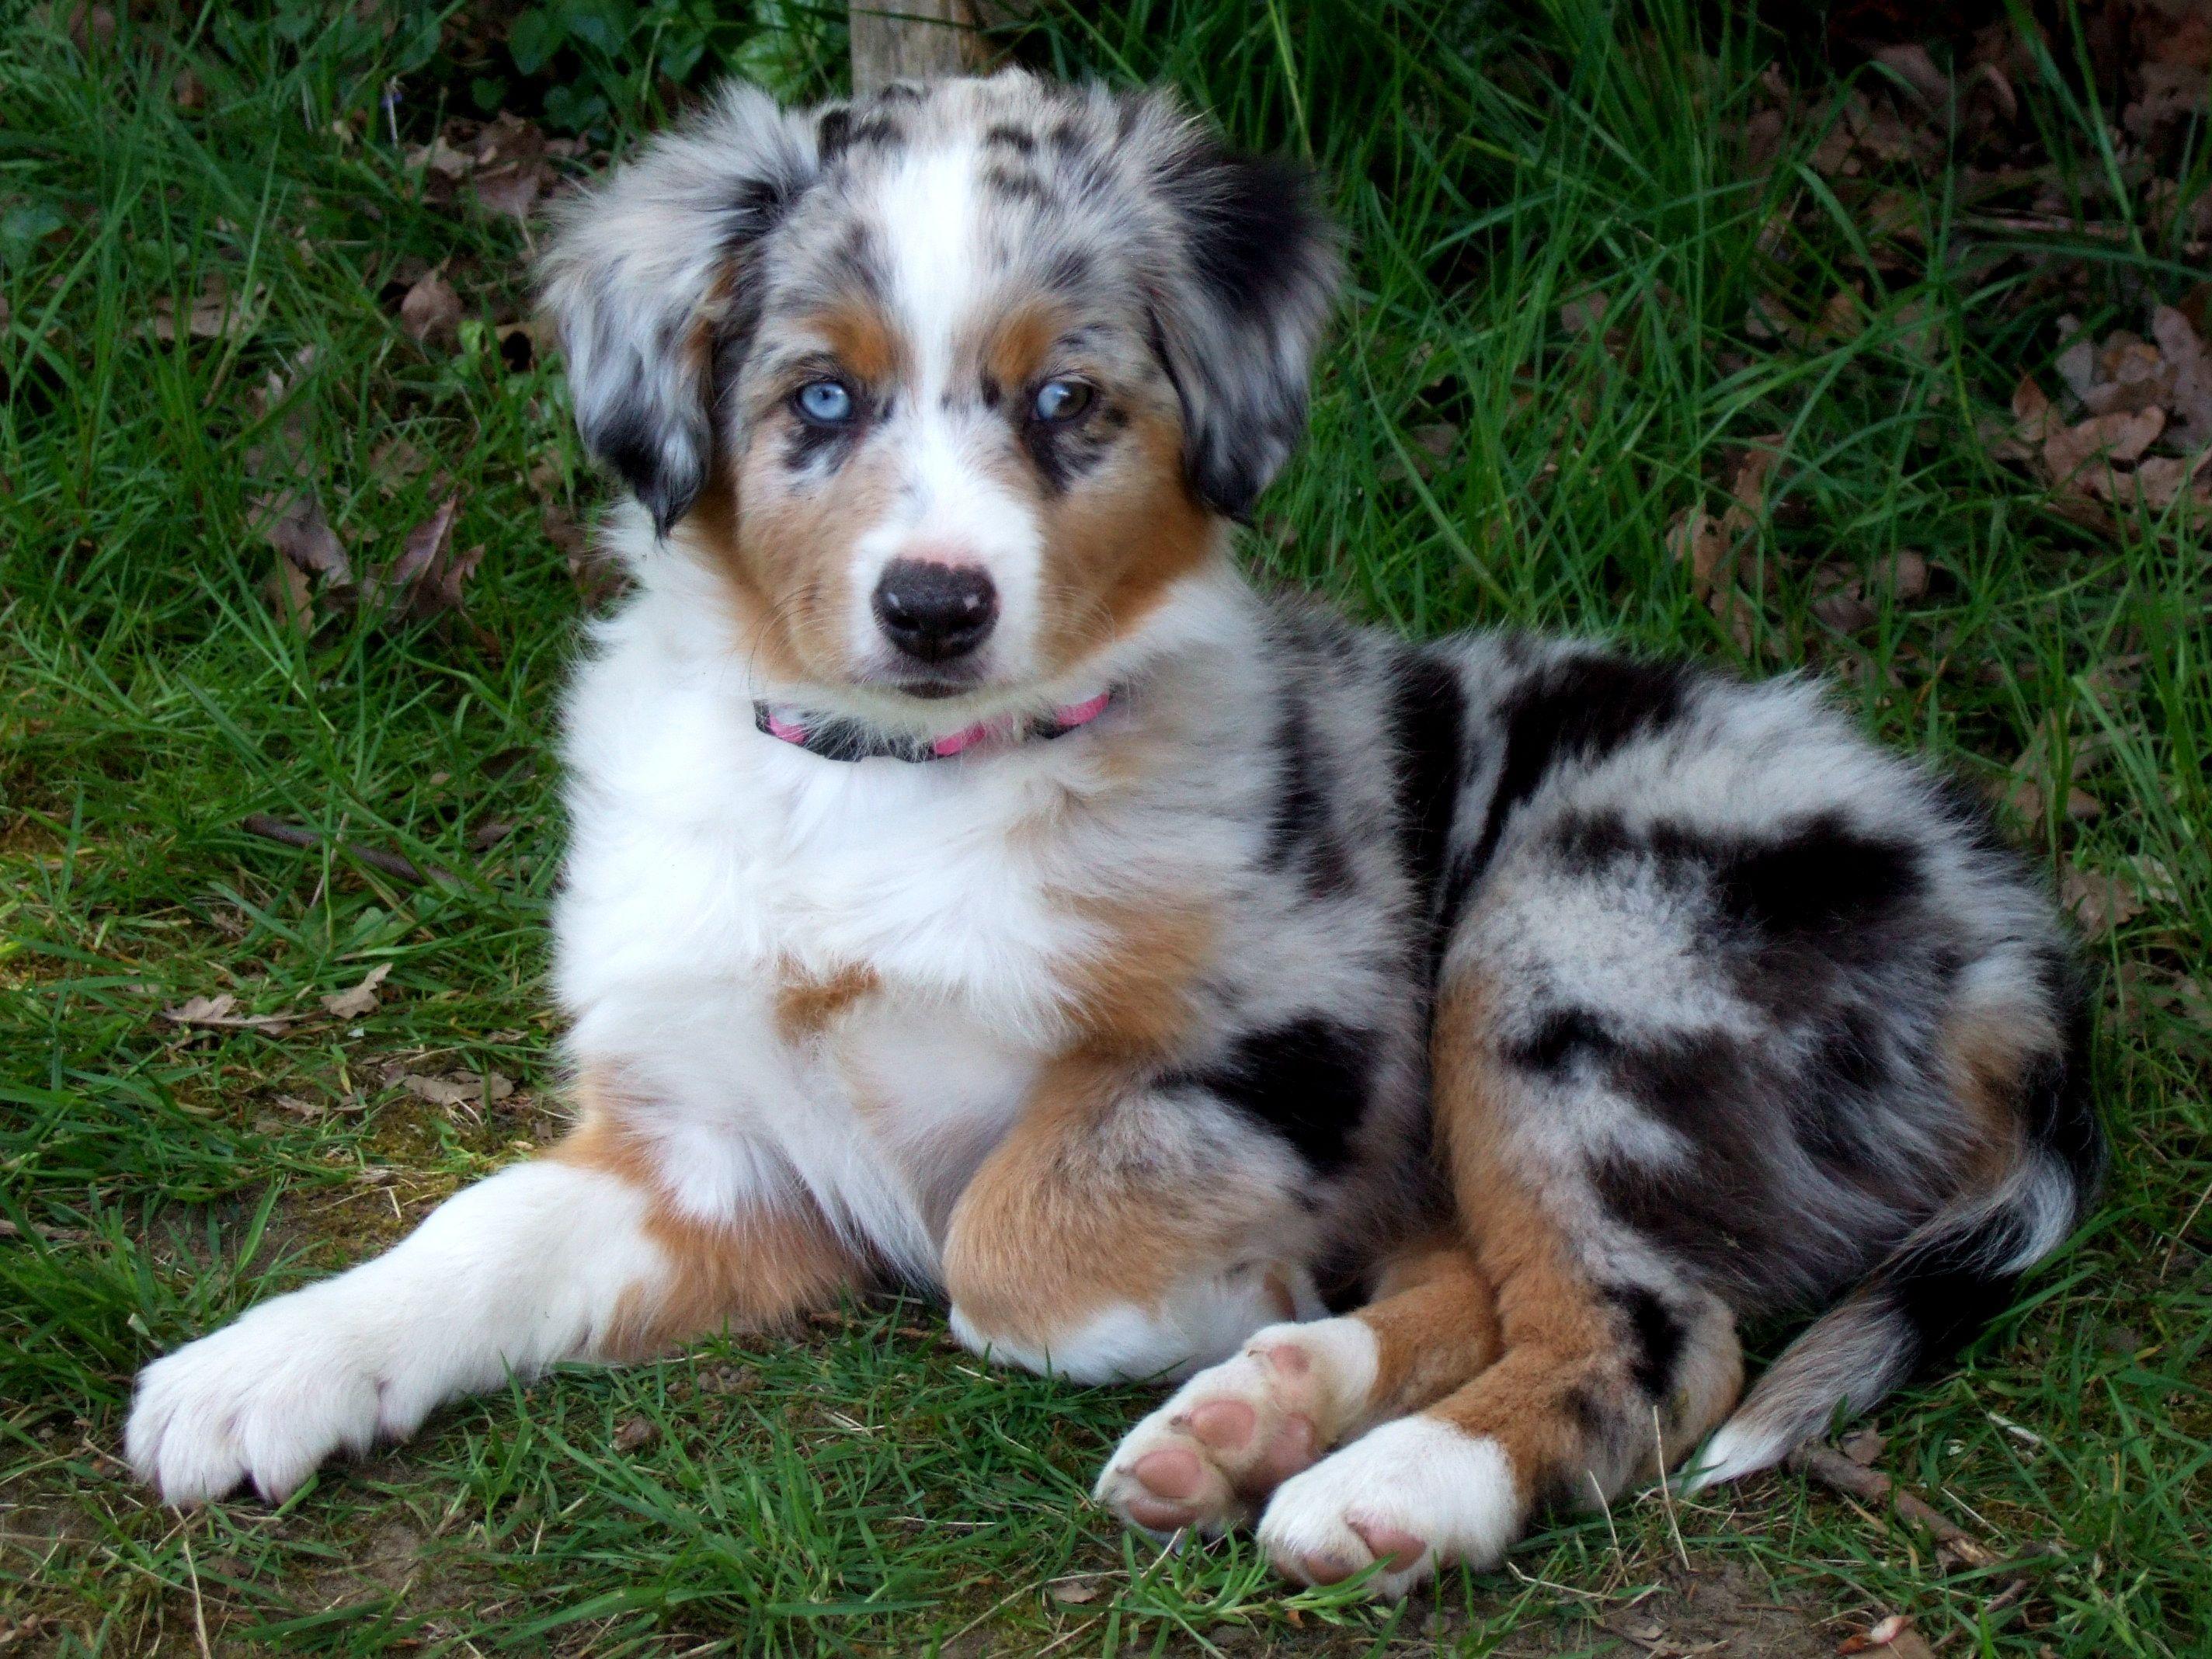 Australian Shepherd Puppy Wallpapers Top Free Australian Shepherd Puppy Backgrounds Wallpaperaccess